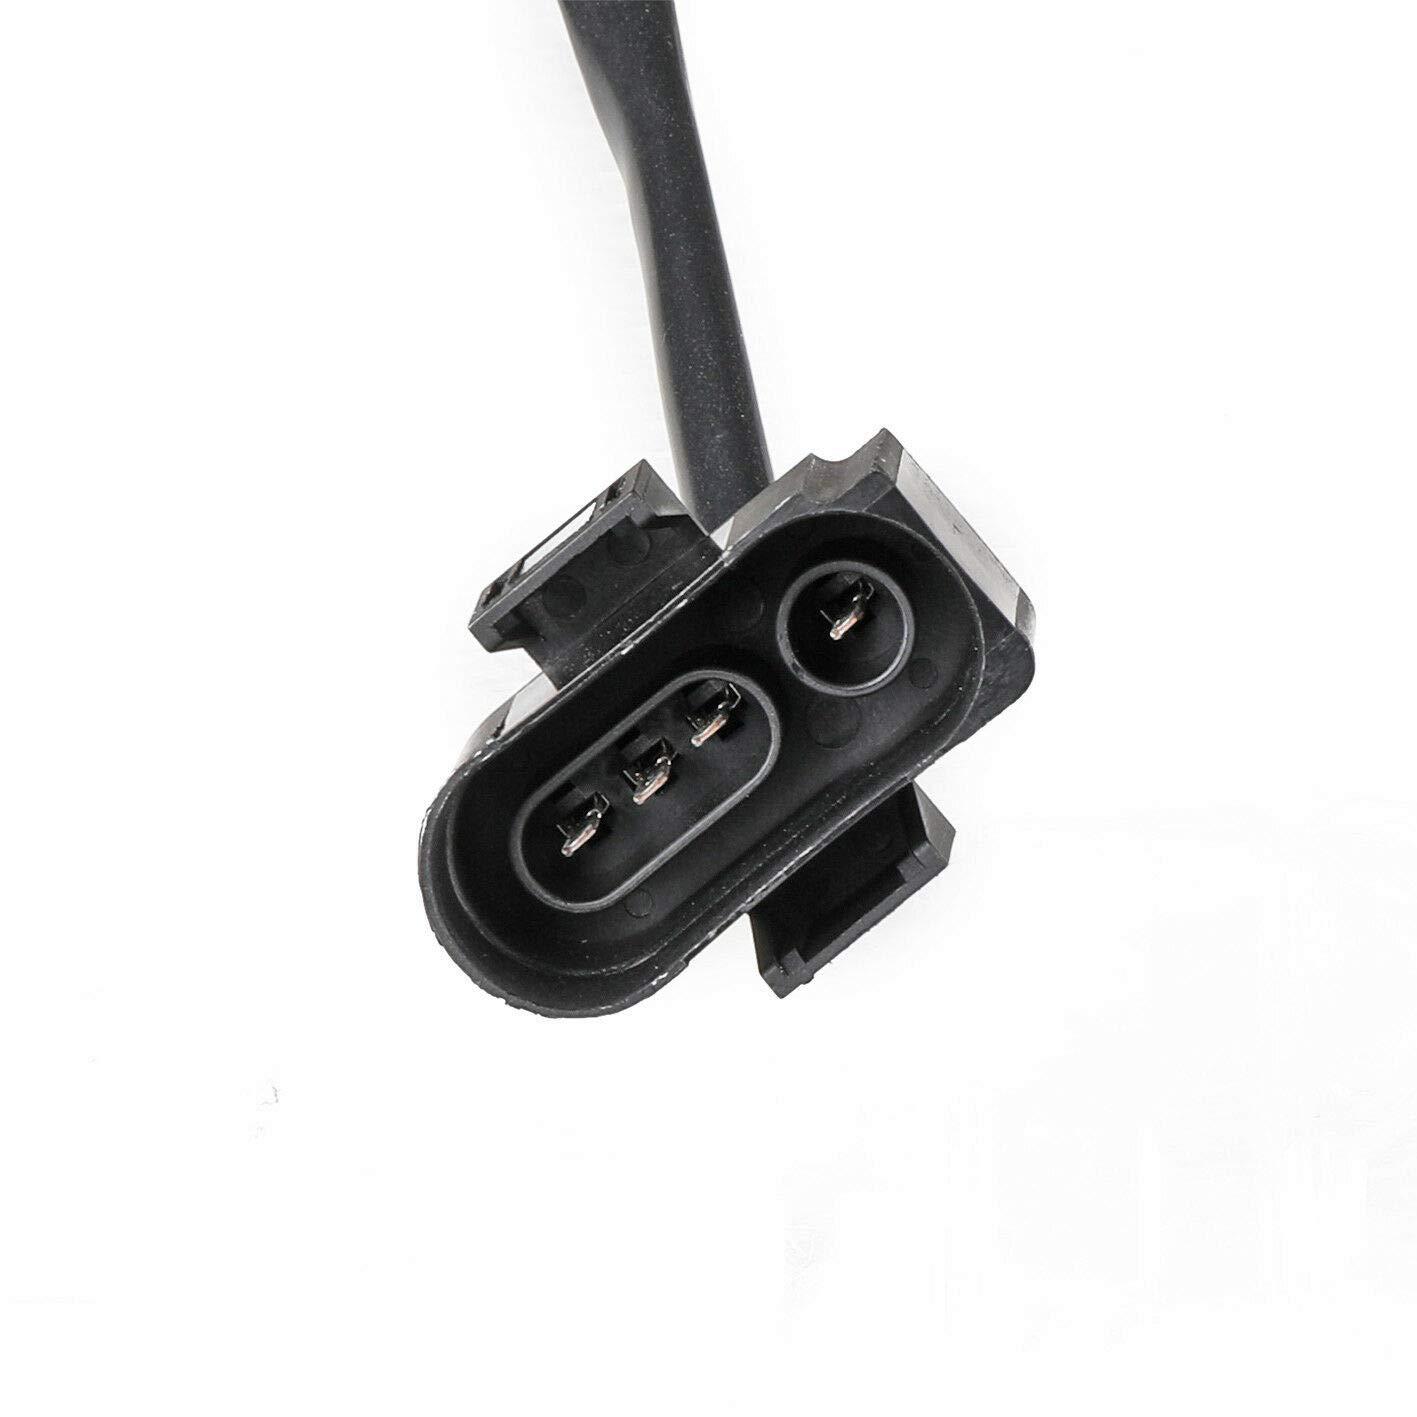 for Volkswagen Passat 2000-2005 Upstream O2 Oxygen Sensor Fit for Audi A4//A4 Quattro 00-01//A6 00-01//A6 Quattro 2000-2004//Allroad Quattro 01//S4 00-02//S6 02-03